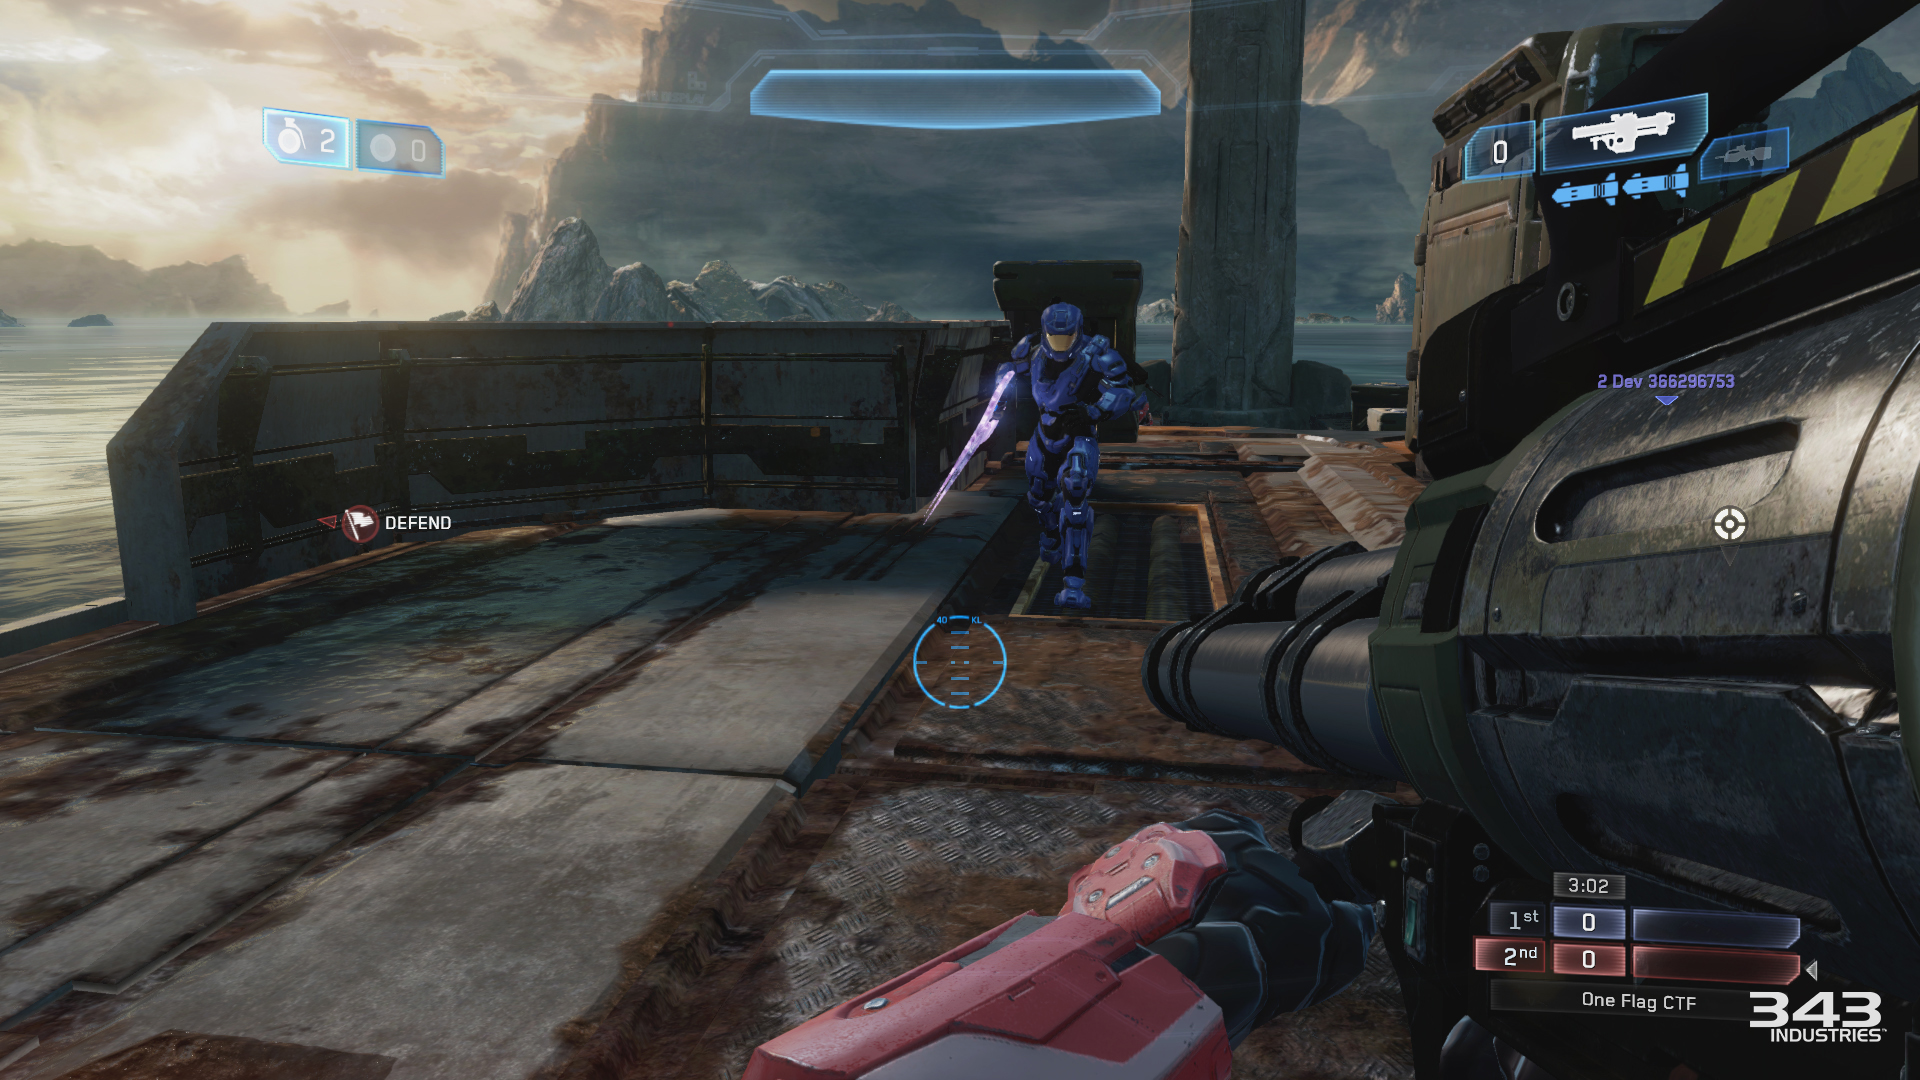 Vyšla kampaň Halo 3: ODST do Halo: The Master Chief Collection 109414